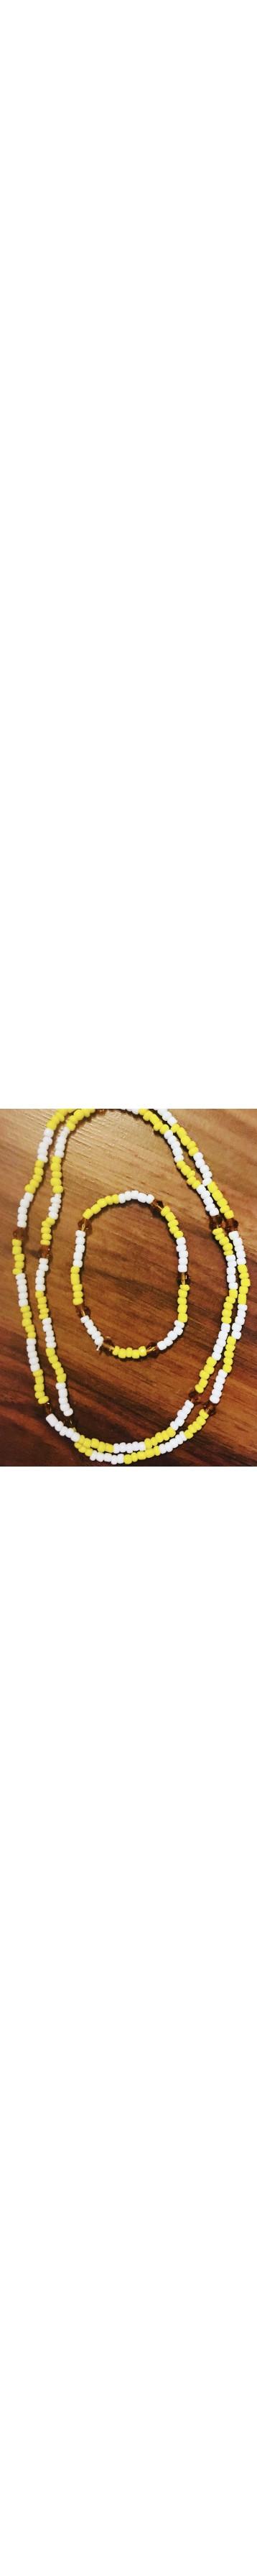 Orisha Osun Eleke Necklace/Ide Set (3)